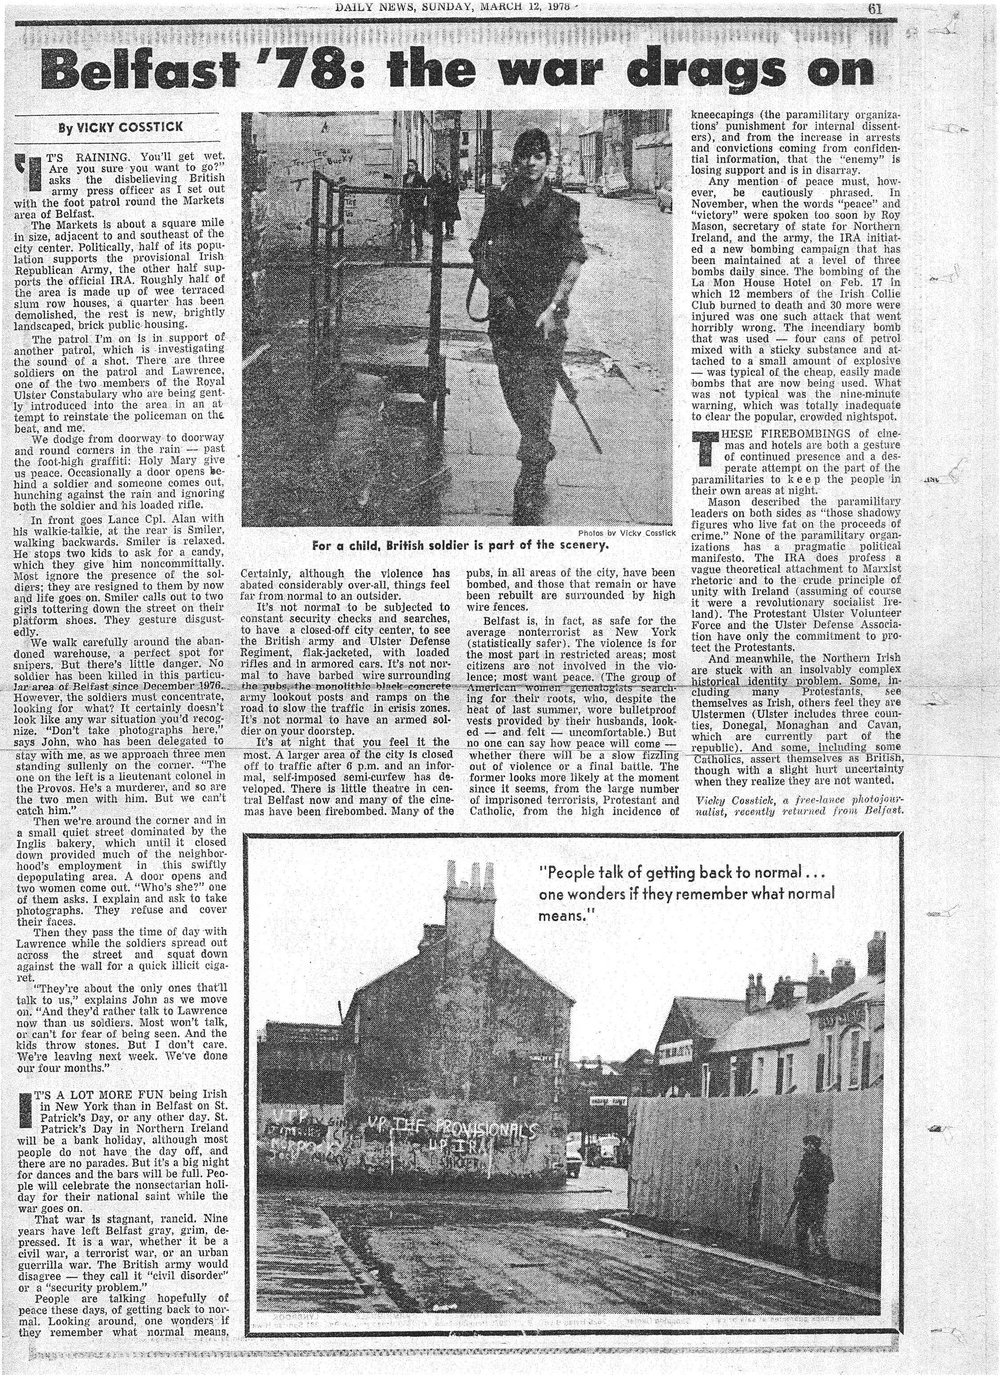 Belfast NY Daily News 78.jpg